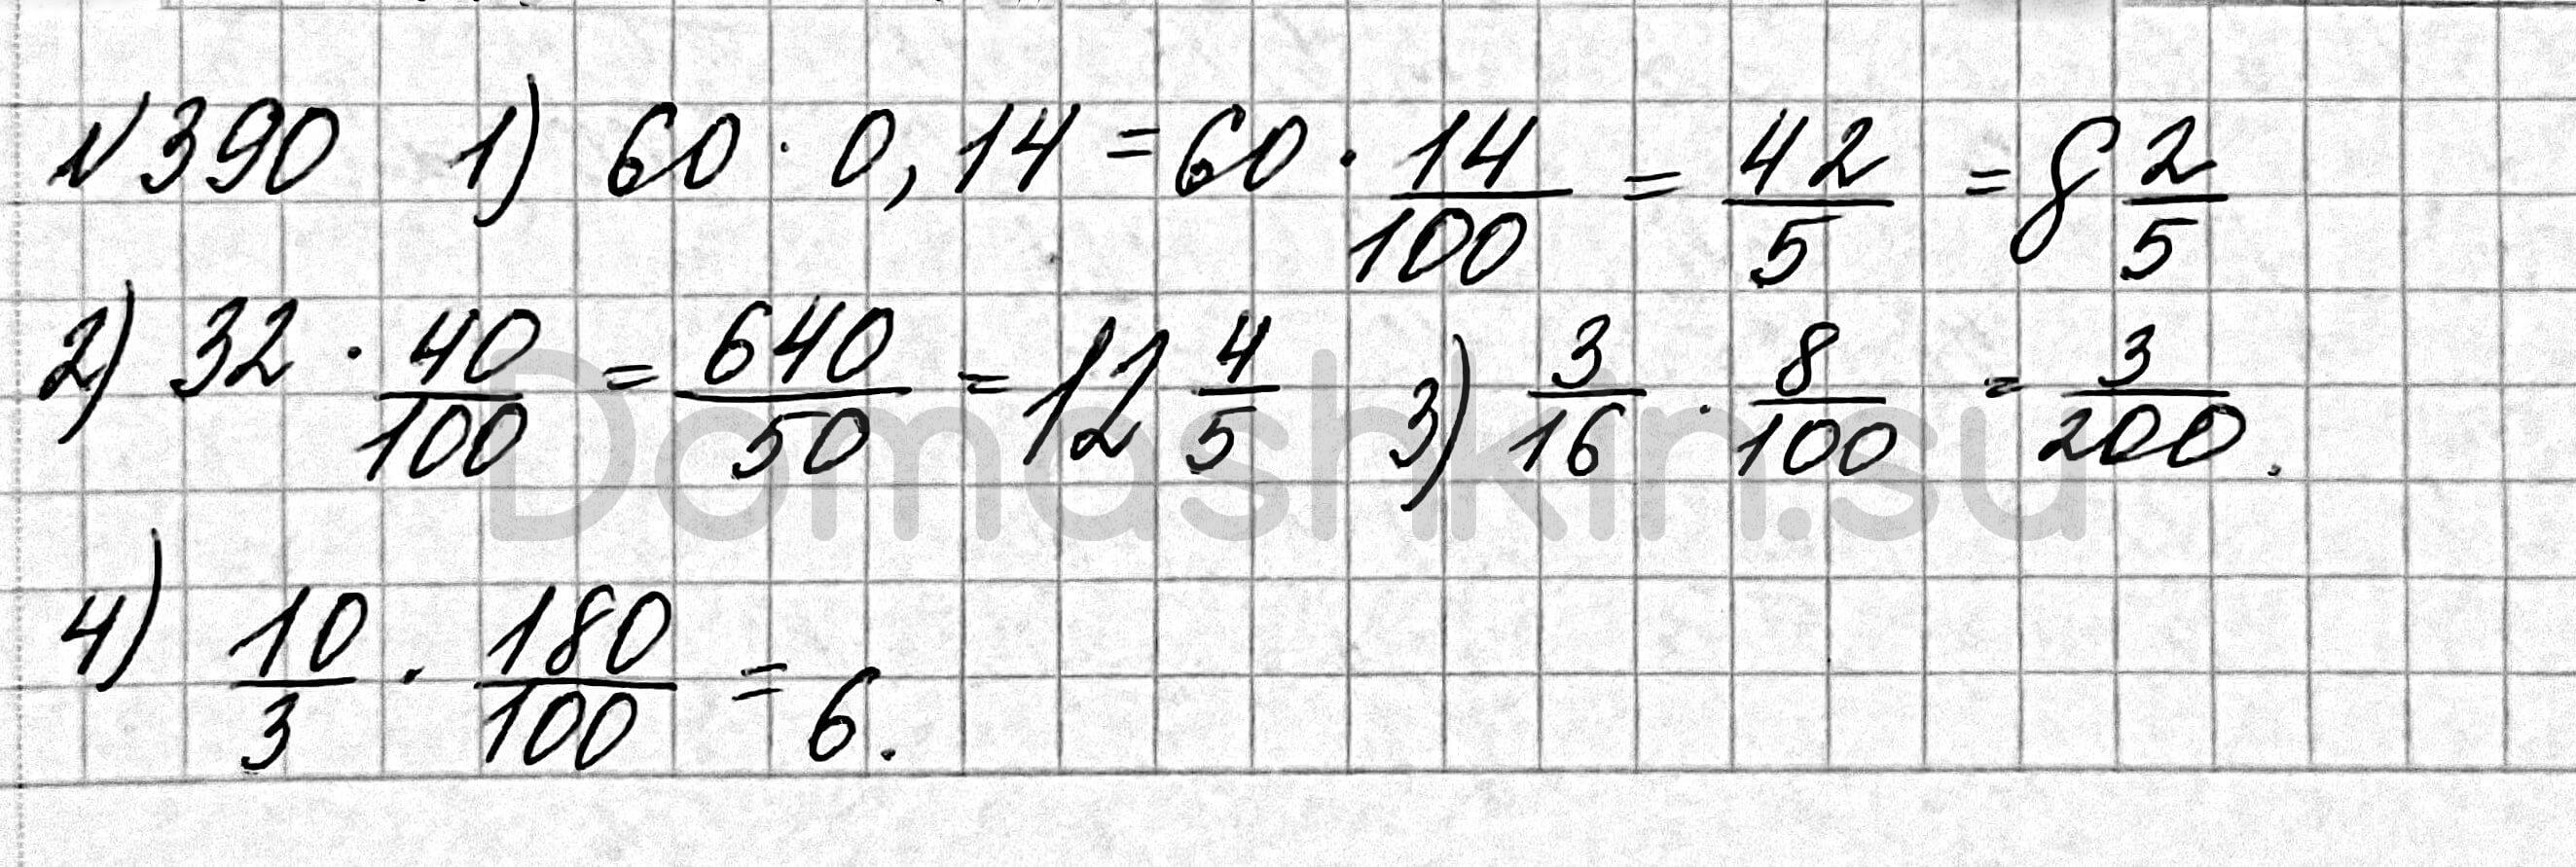 Математика 6 класс учебник Мерзляк номер 390 решение